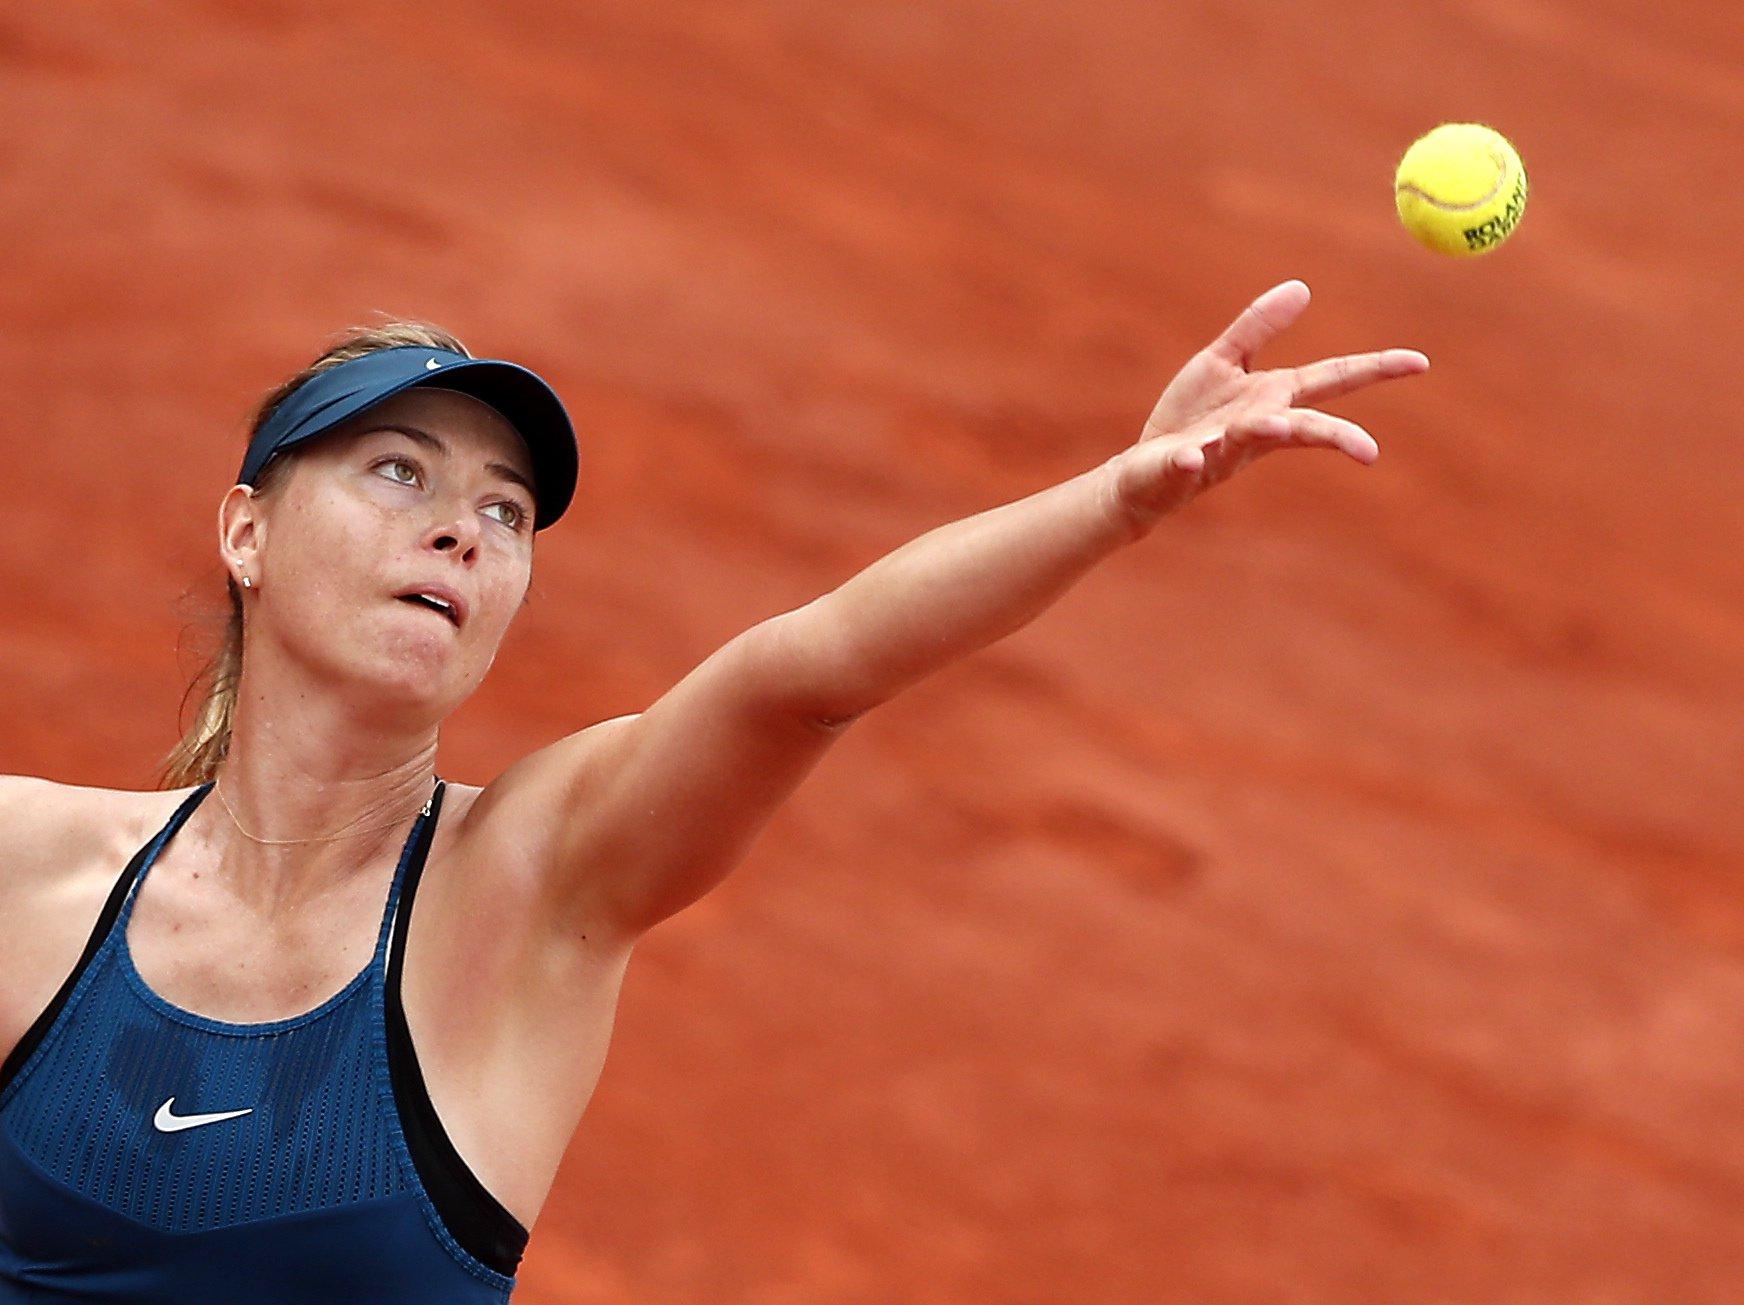 French Open Day 7 schedule: Order of play with Nadal, Serena & Sharapova-Pliskova